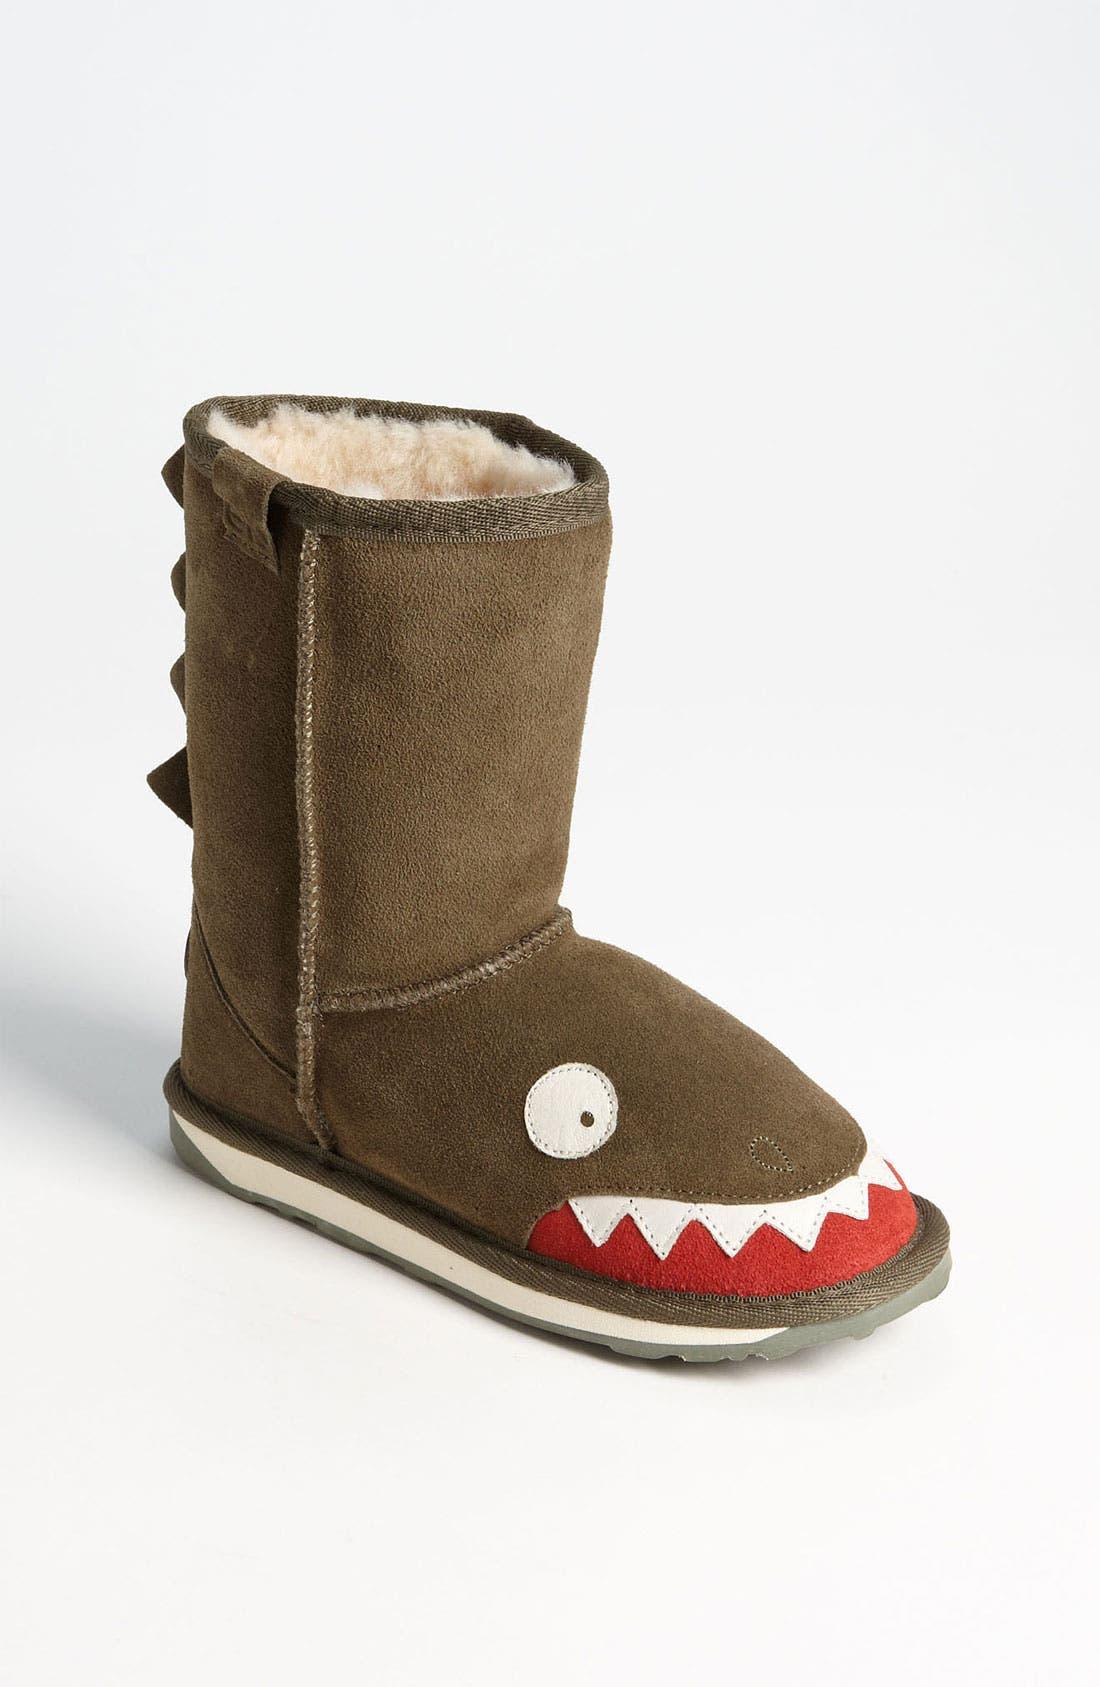 Main Image - EMU Australia 'Little Creatures - Croc' Boot (Toddler, Little Kid & Big Kid)